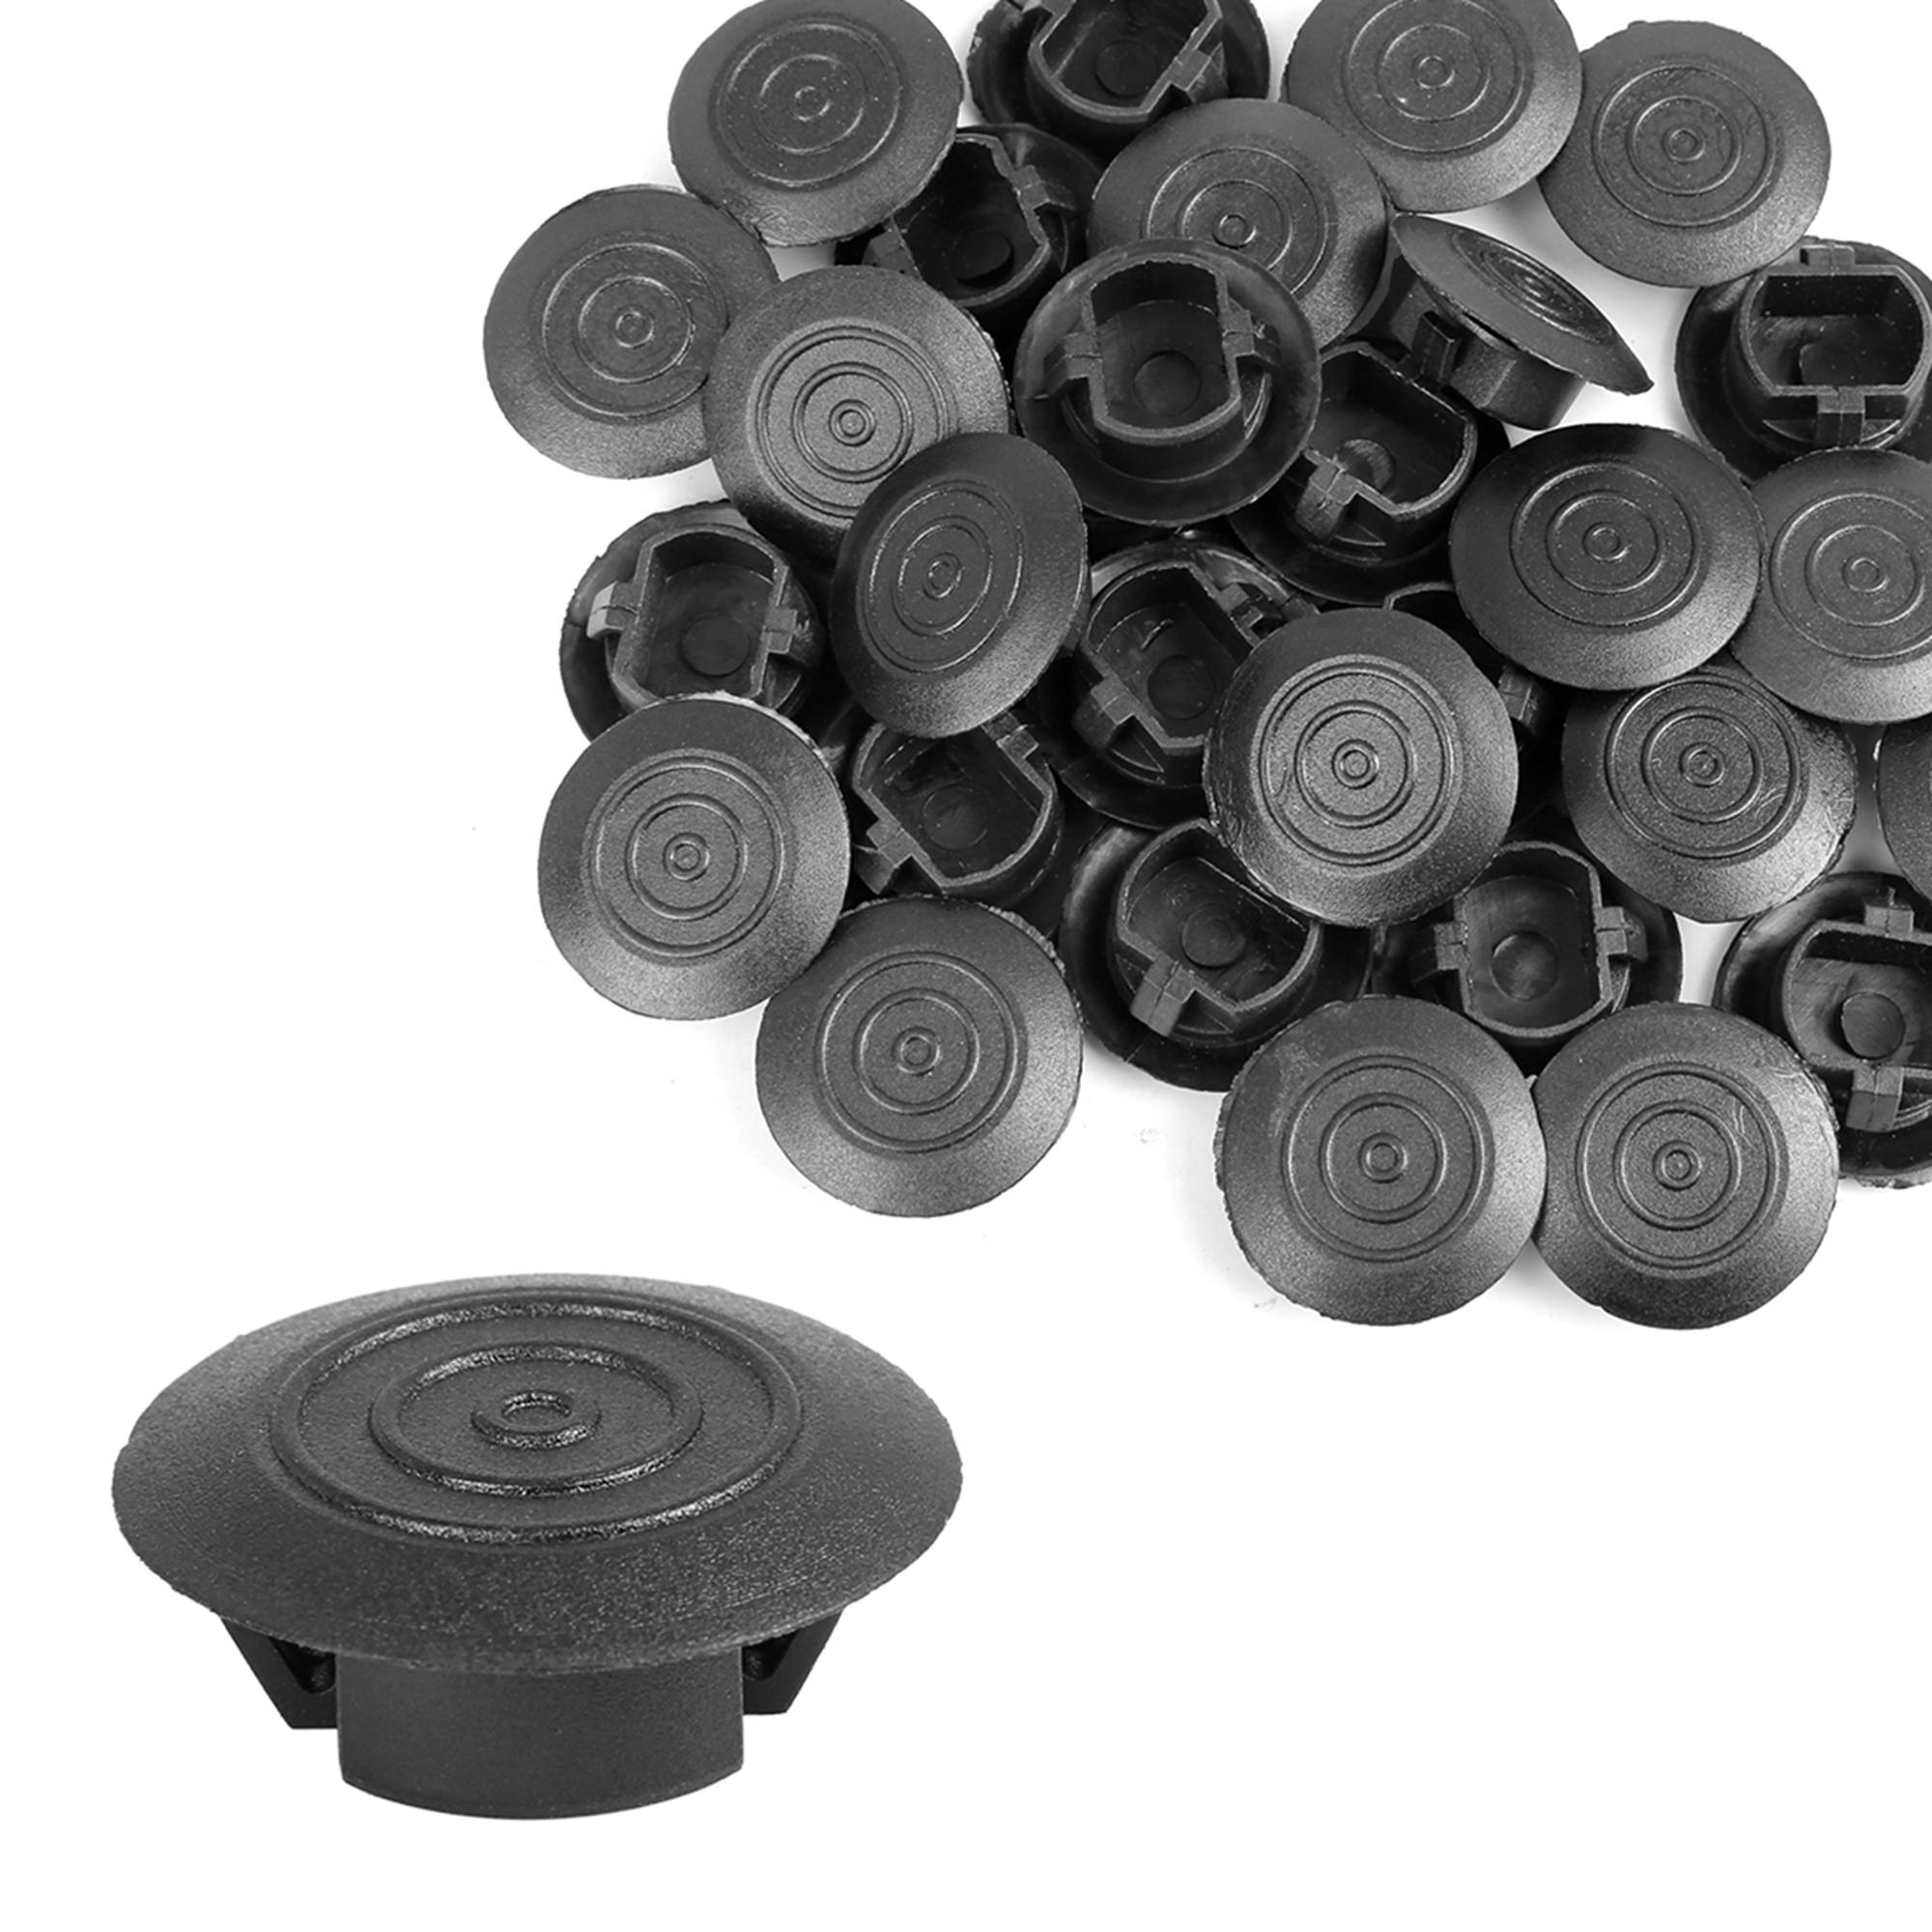 30pcs Nylon Panel Moulding Retainer Clips for Toyota Scion Pontiac 76924-52021